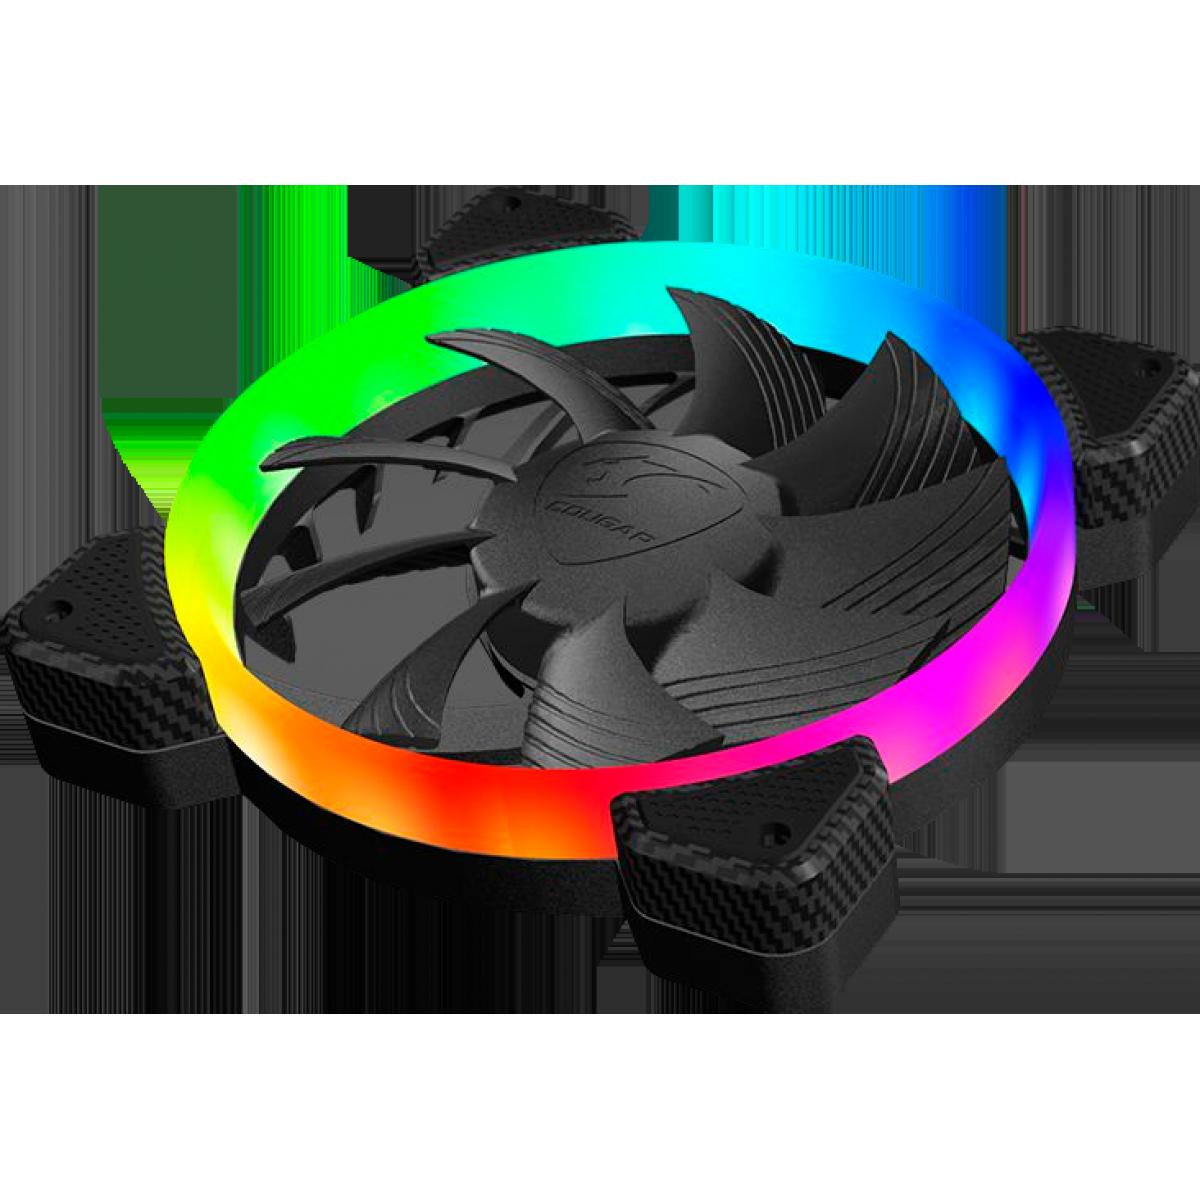 Cooler para Gabinete Cougar Vortex HPB, RGB 120mm, 3MHPB120.0001